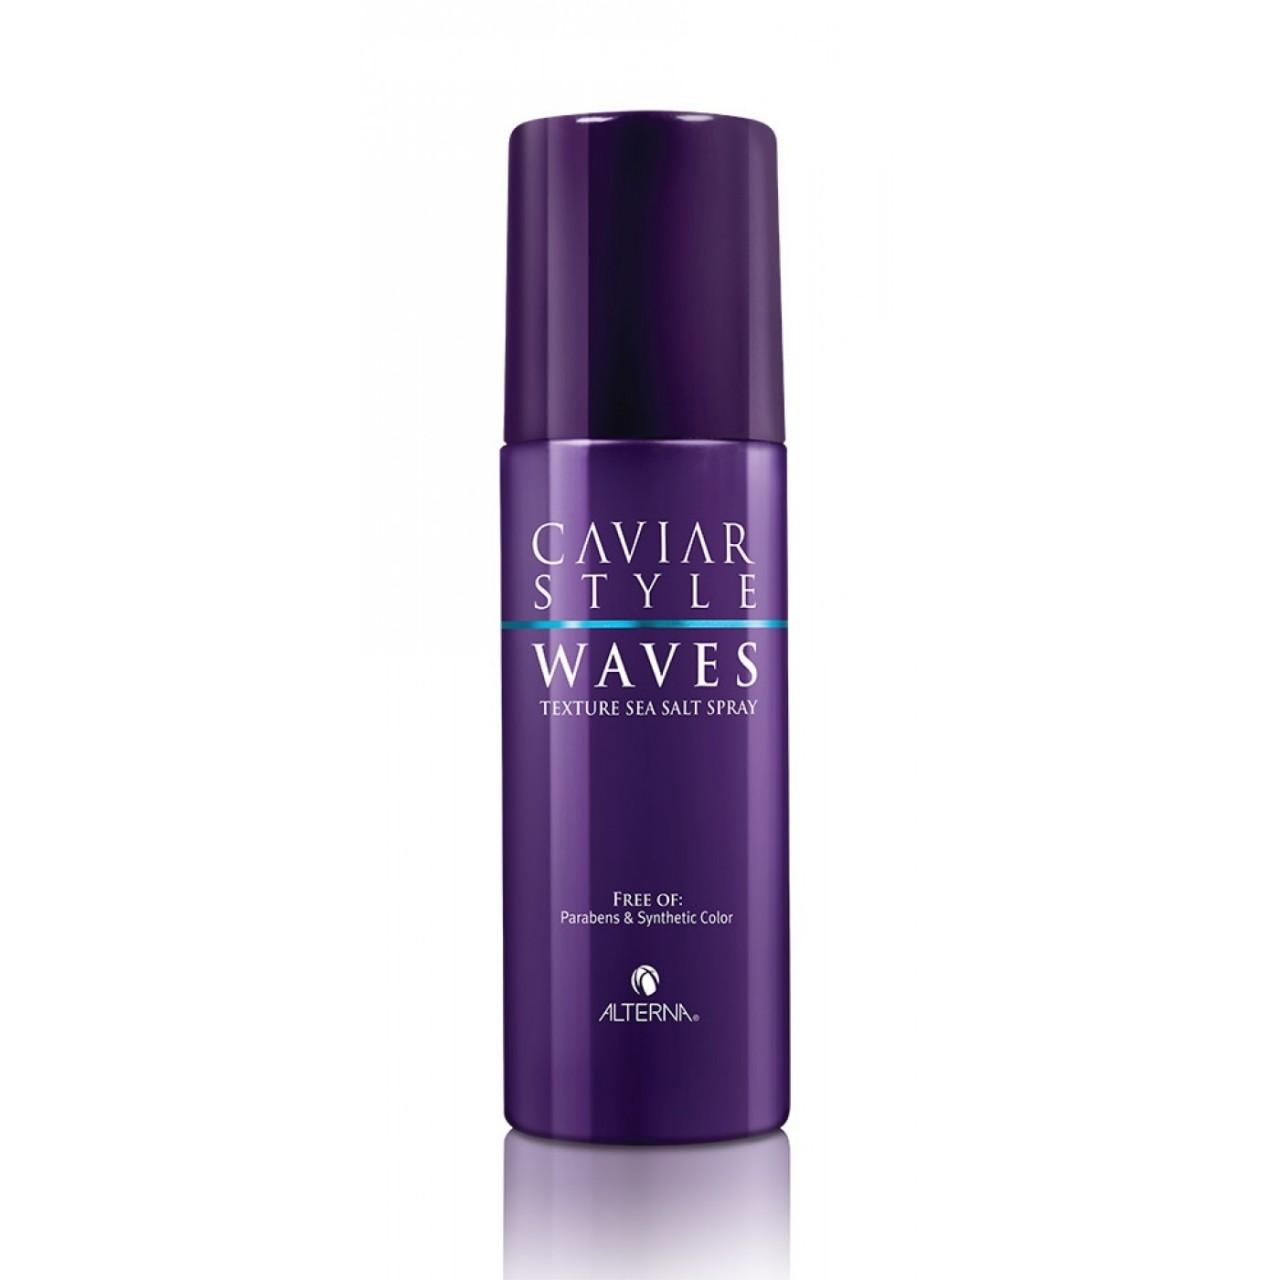 ALTERNA CAVIAR STYLE Waves Texture Sea Salt Spr...